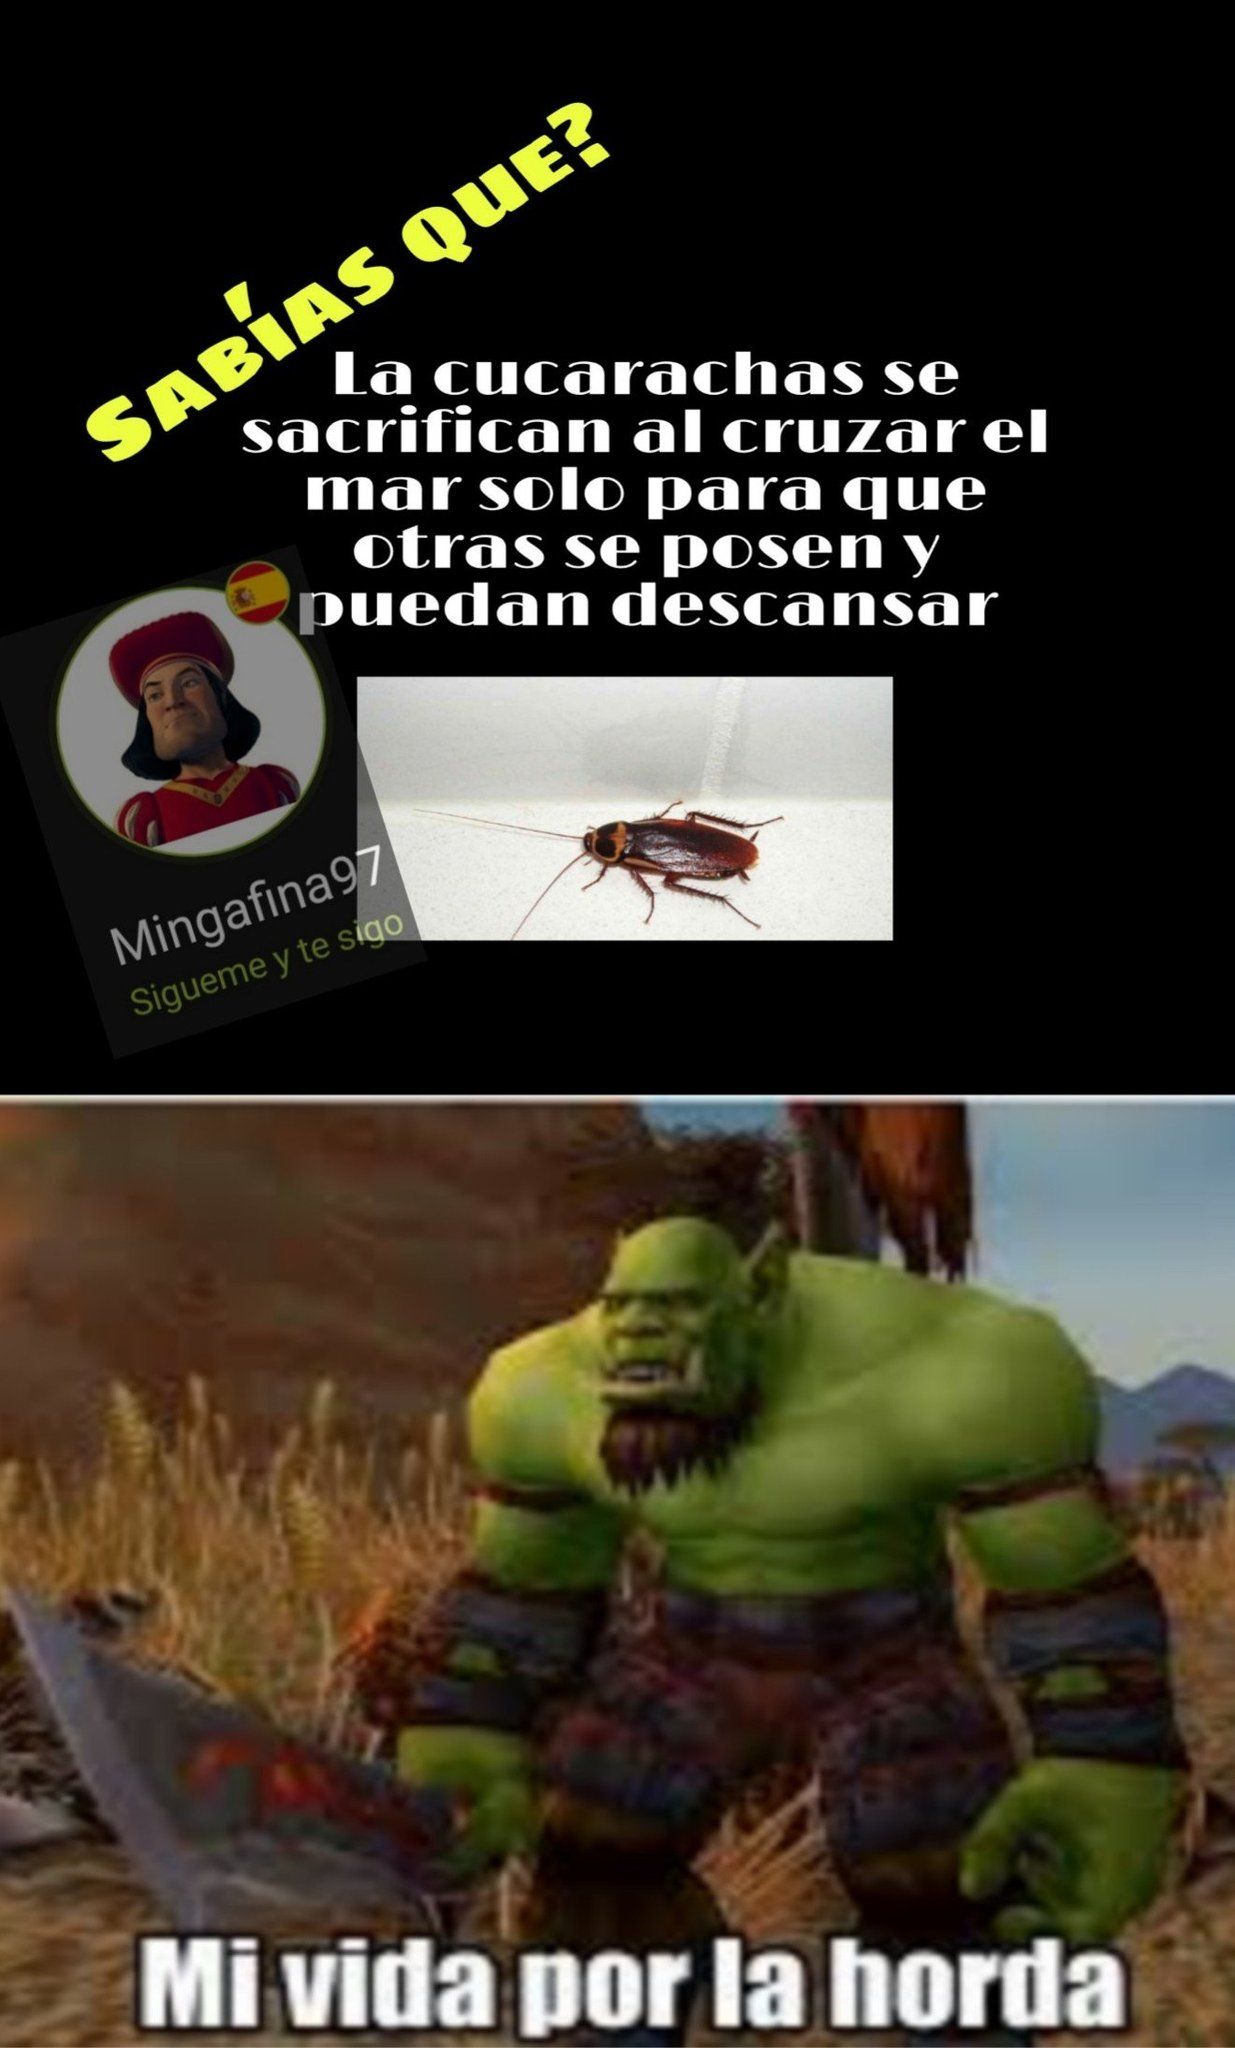 La horda - meme